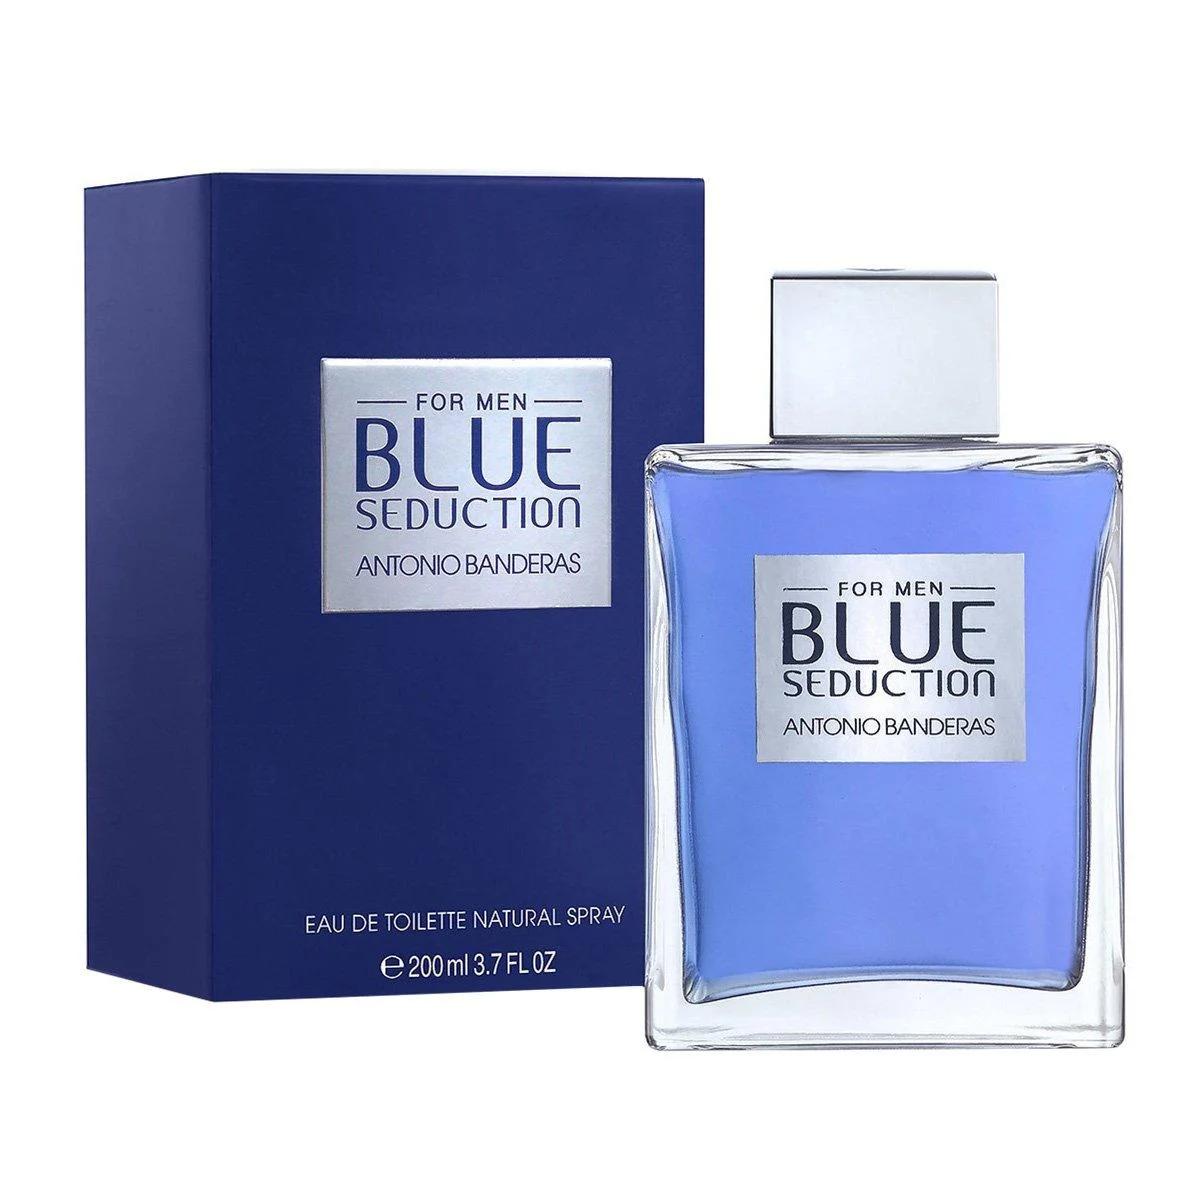 антонио бандерас туалетная вода мужская Blue цена